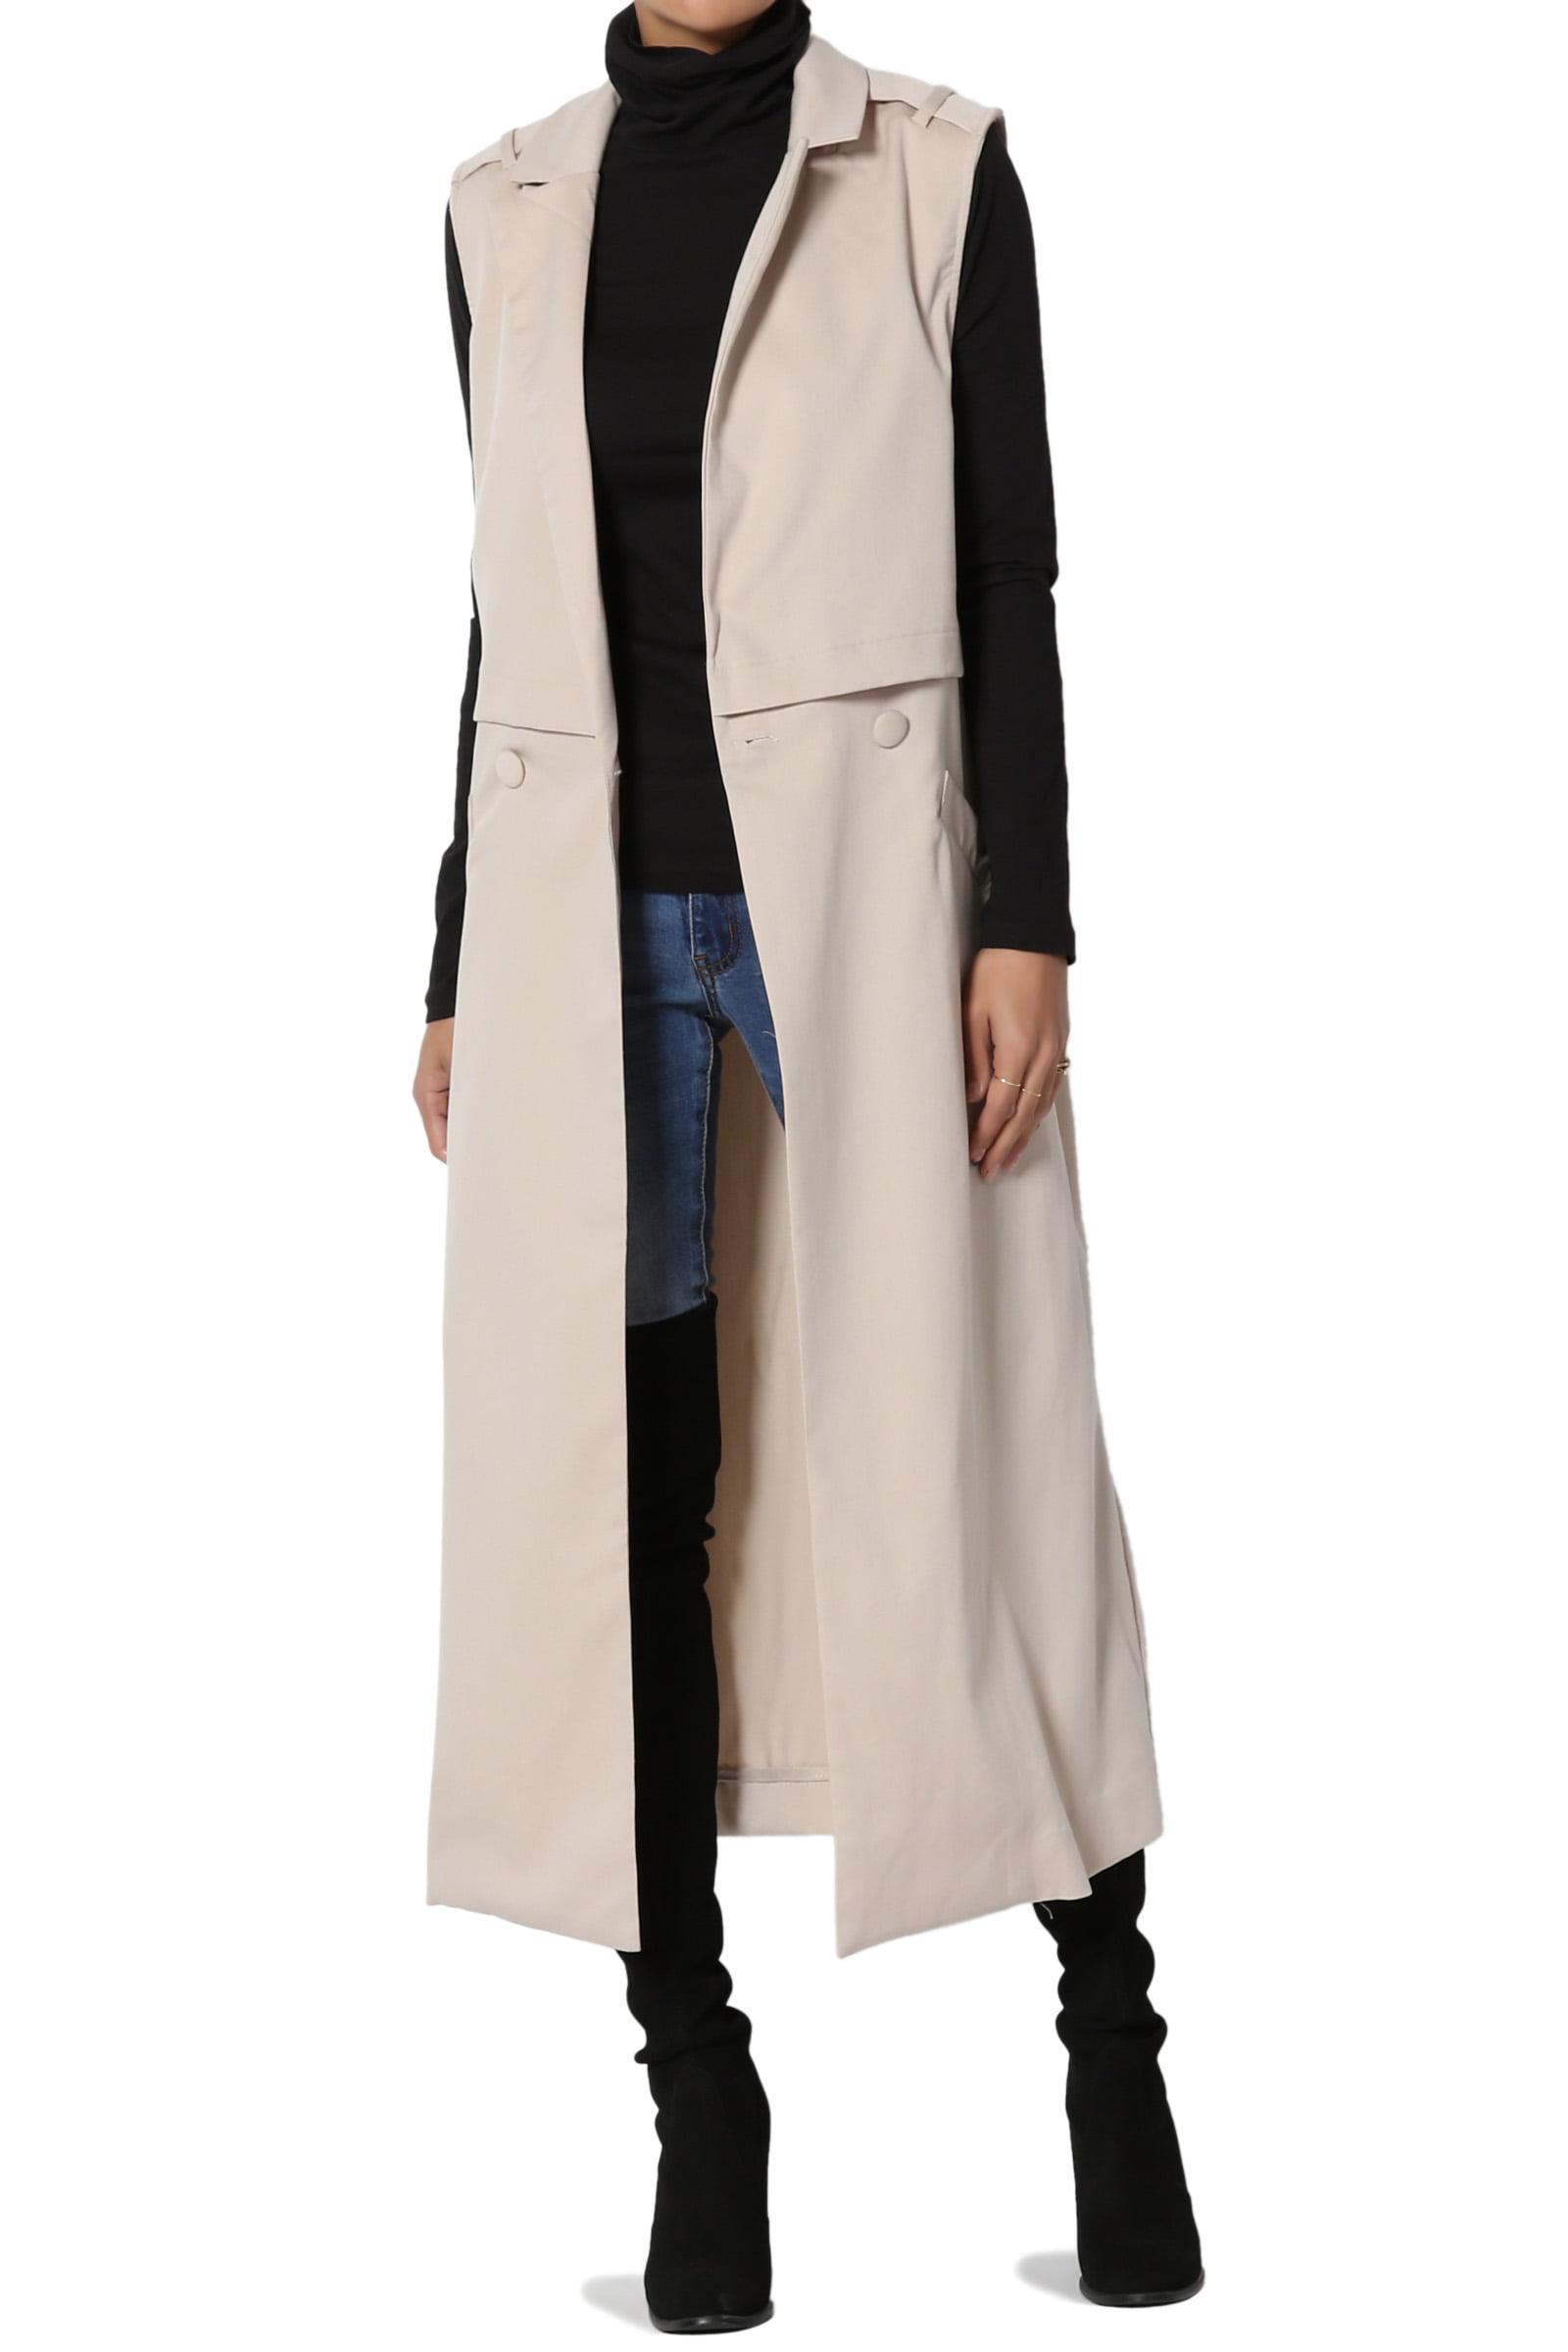 Womens Trench Jacket Double Breasted Lapel Belt Sleeveless Long Waistcoat Vests